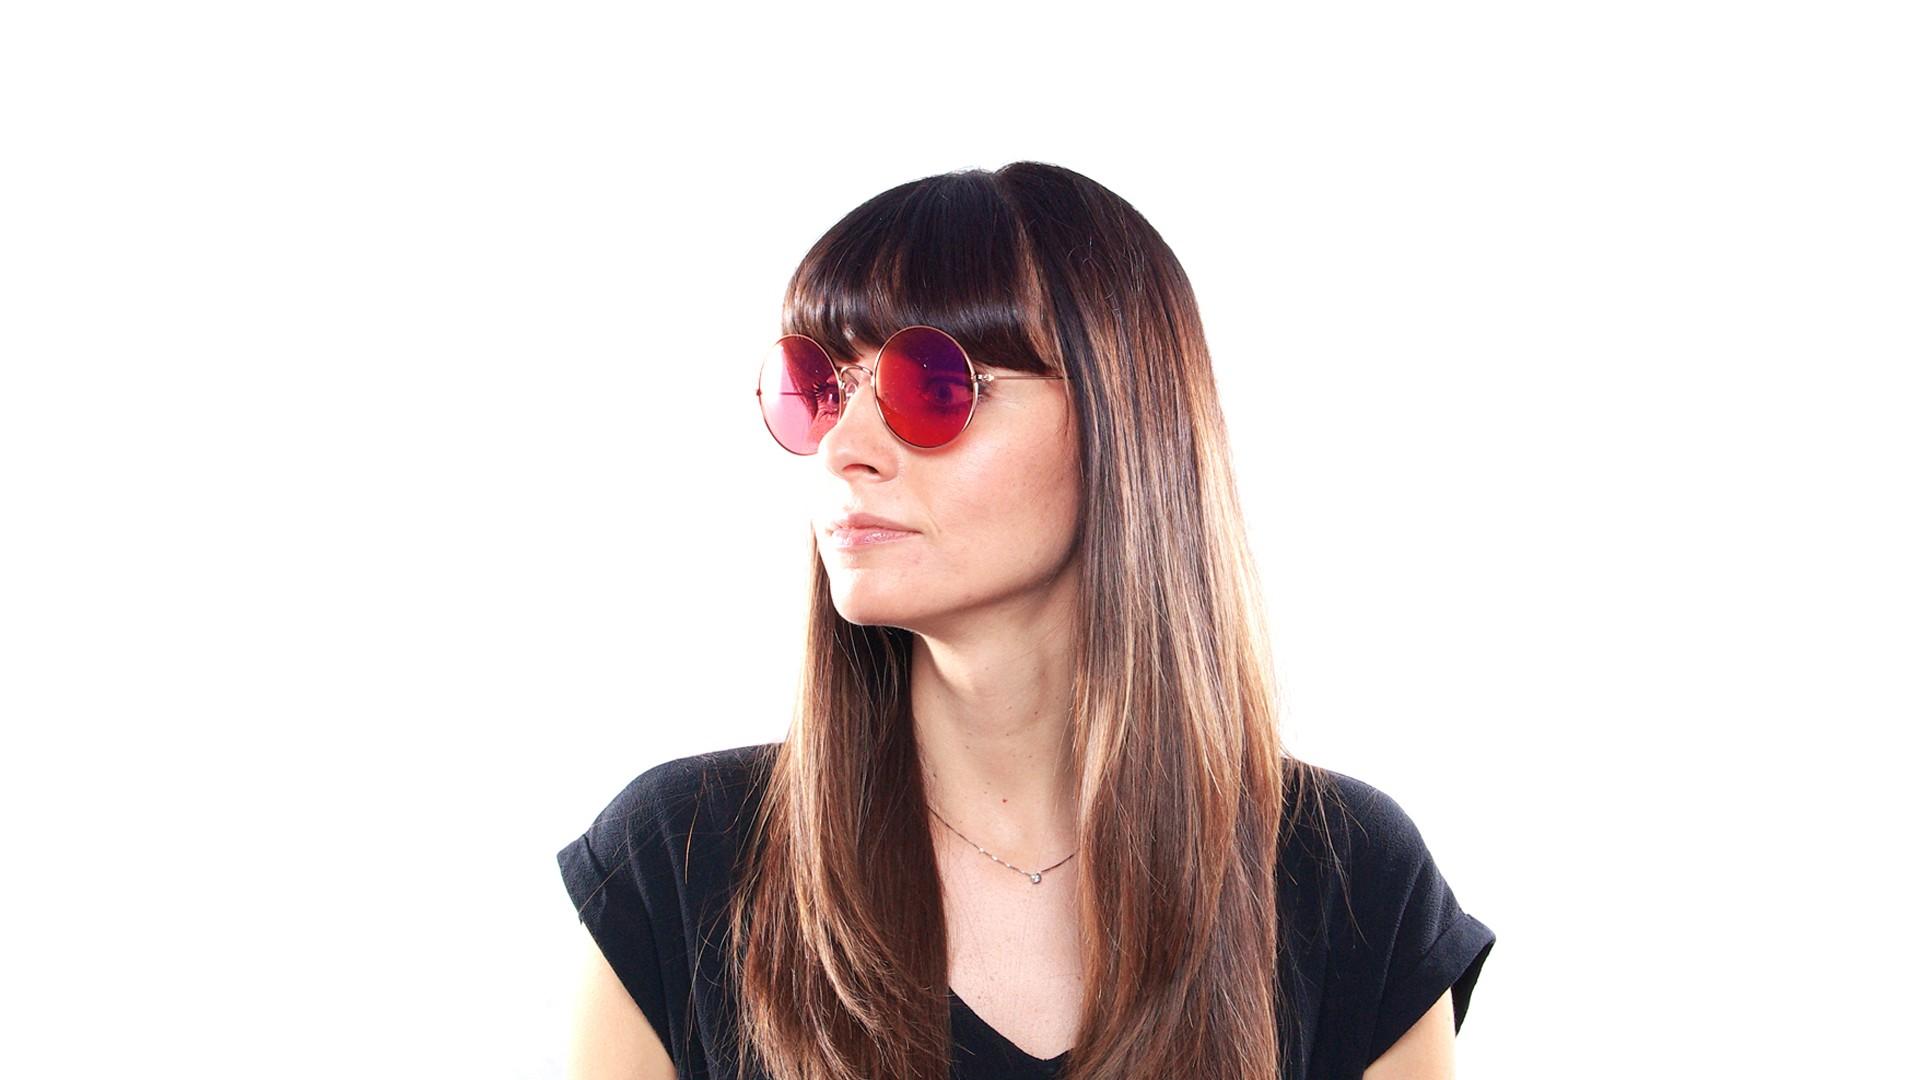 ef8084942 Sunglasses Ray-Ban Ja-jo Copper RB3592 9035C8 55-20 Large